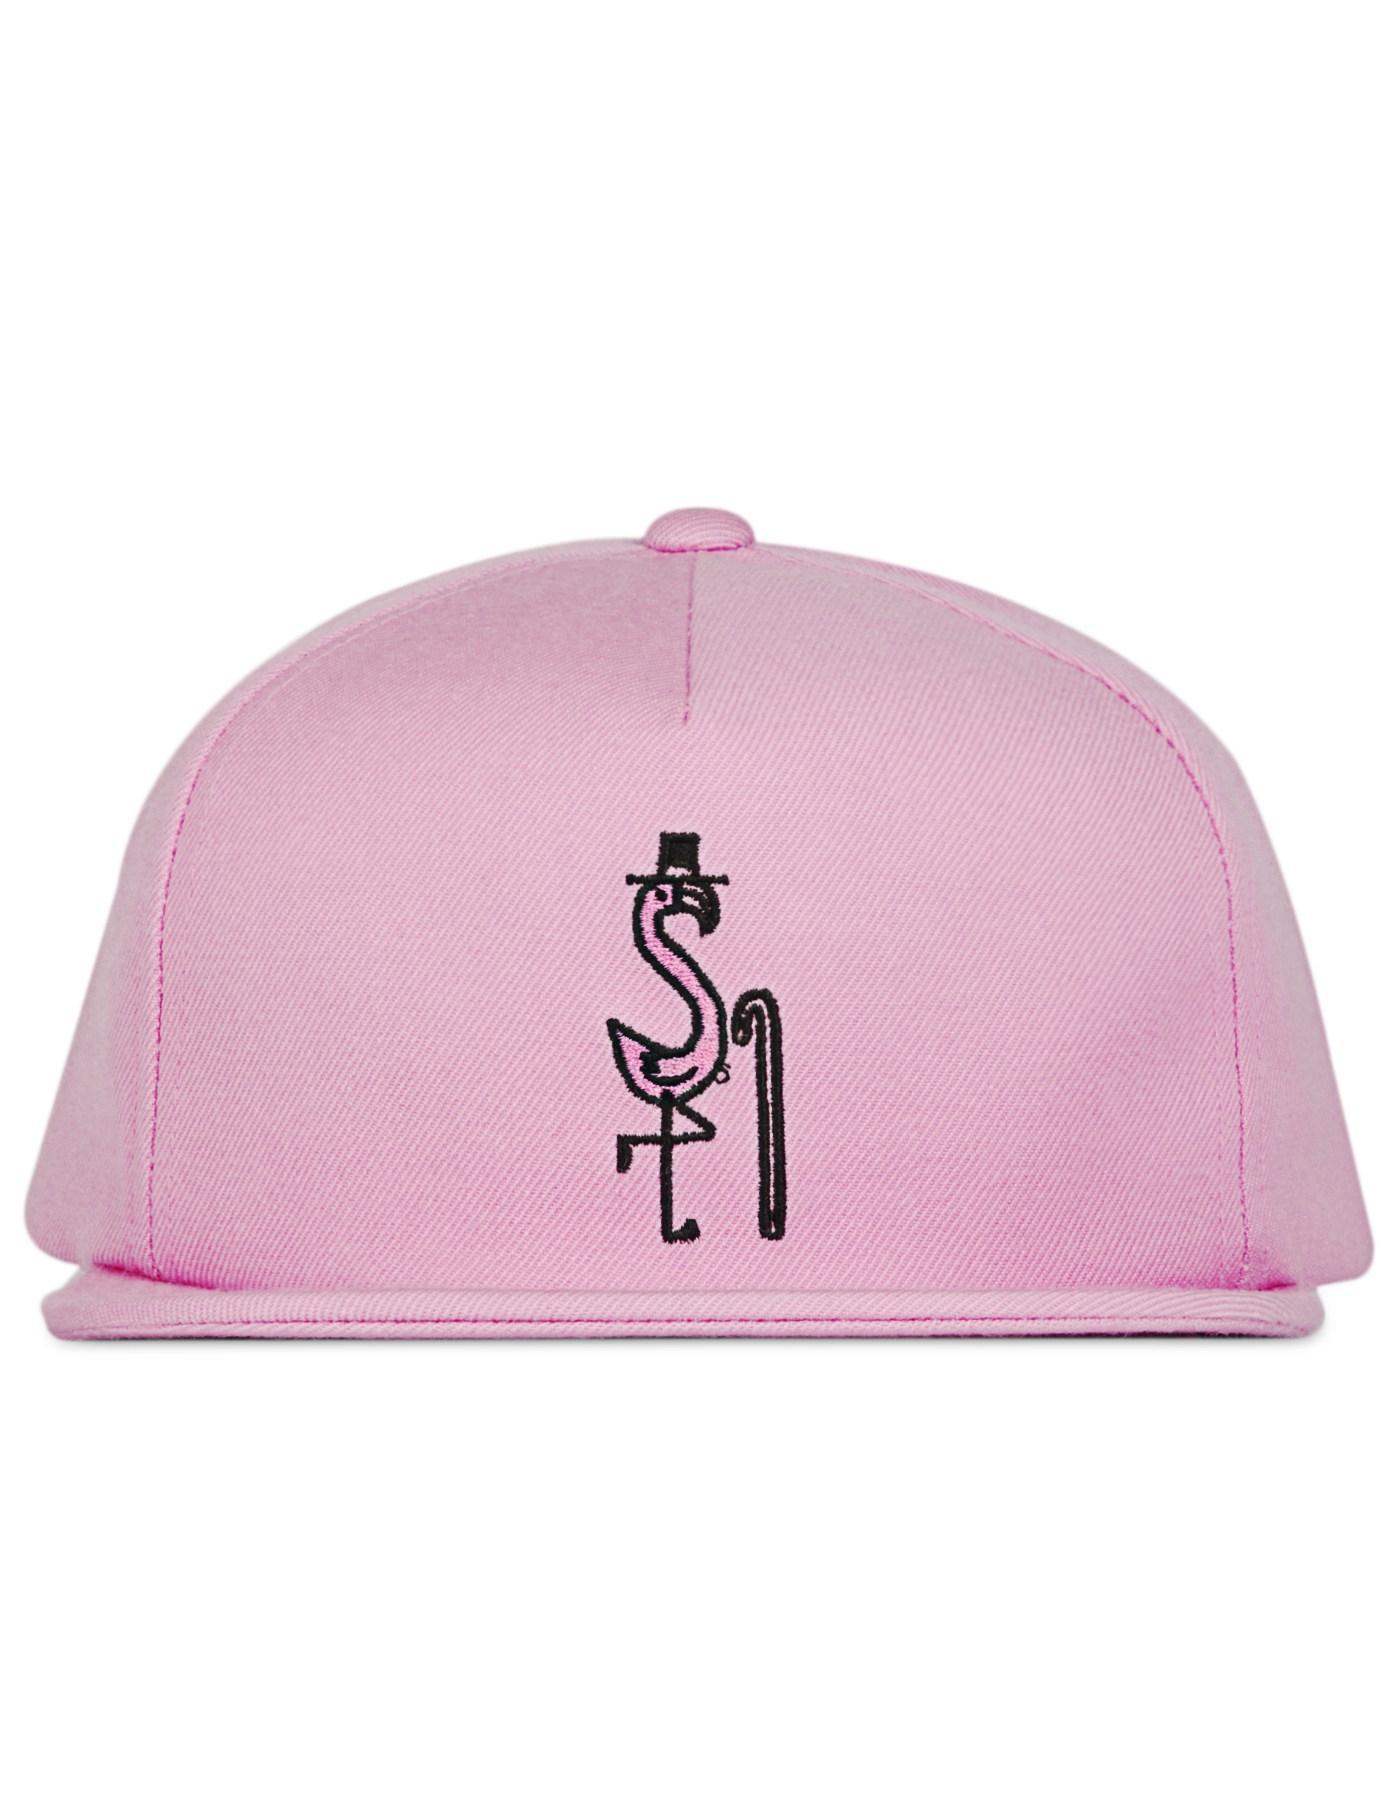 Dc Hbx Lyst Stussy Flamingo Cap In Pink